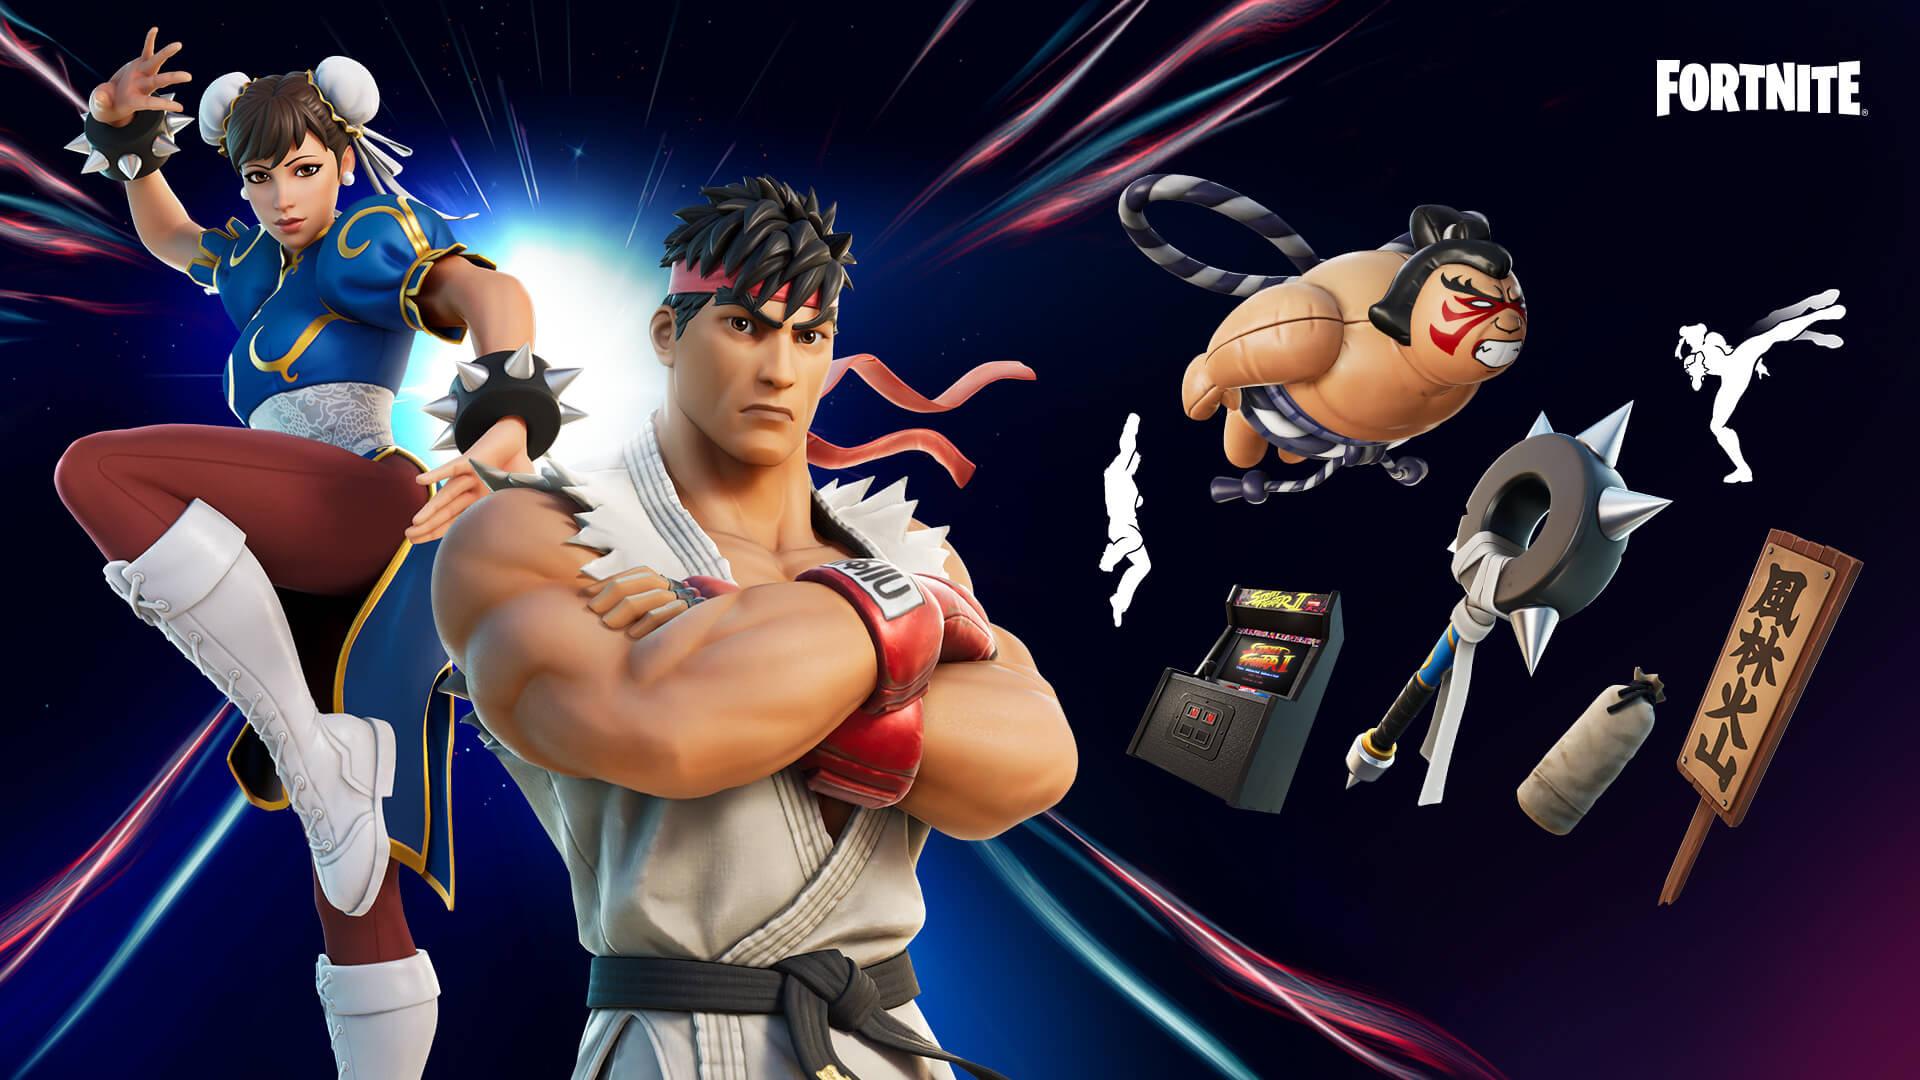 Street Fighter x Fortnite lote